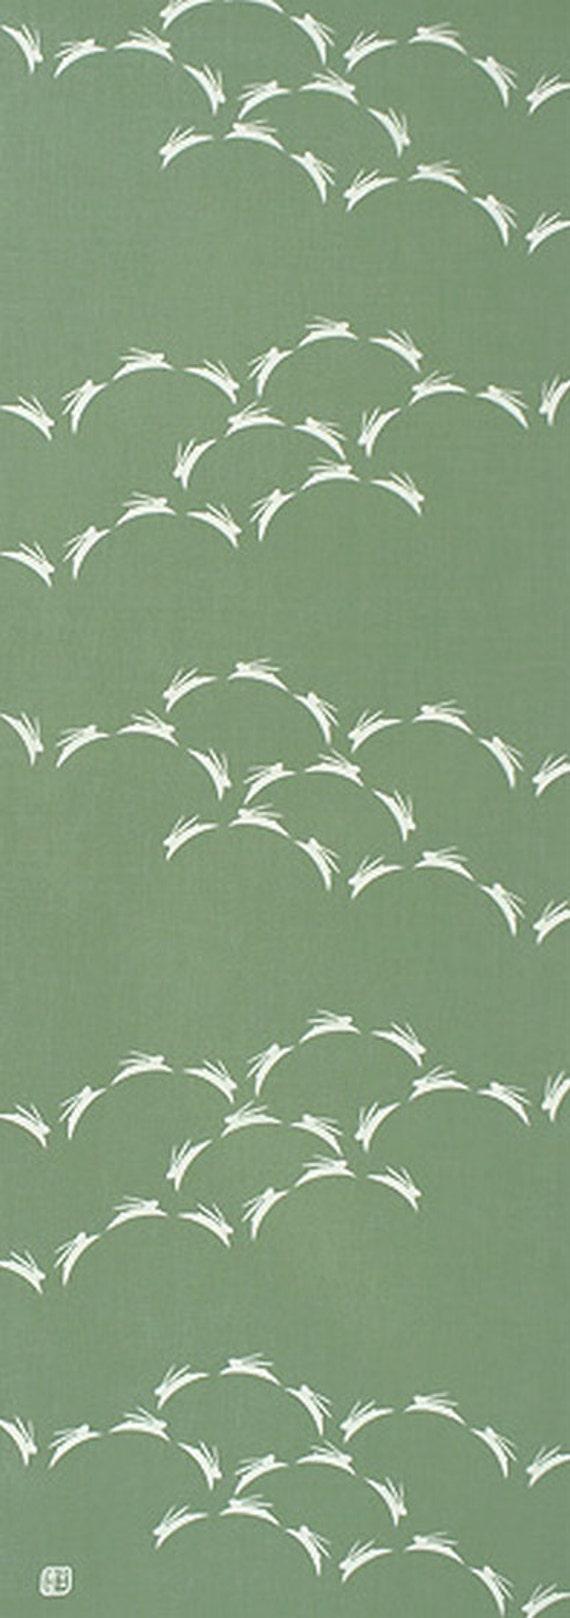 Japanese tenugui towel cotton fabric rabbit design for Modern home decor fabric prints